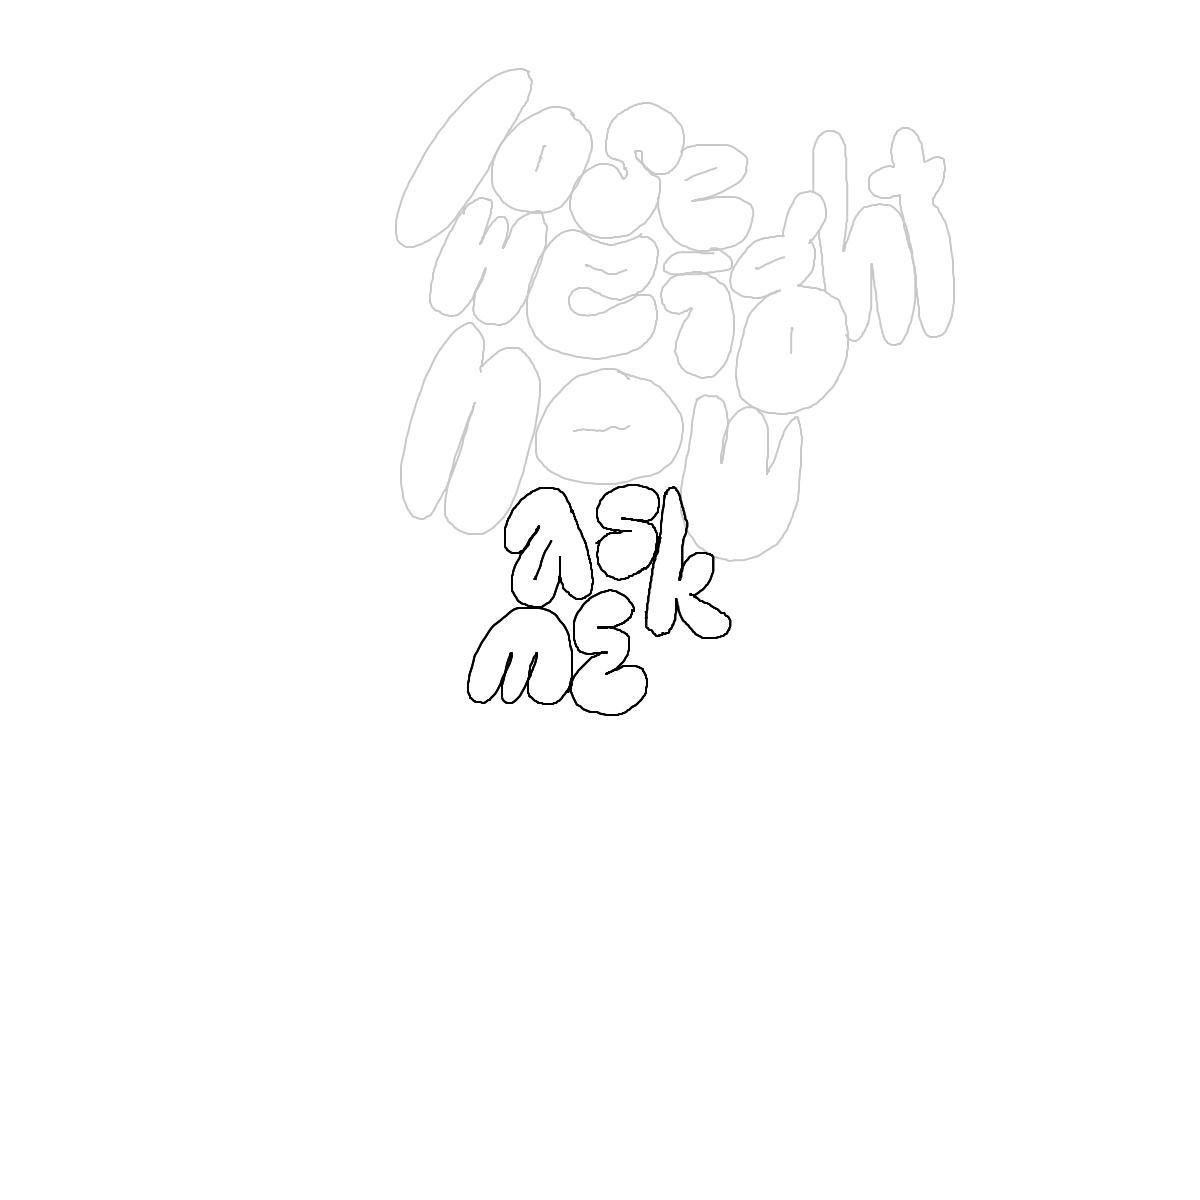 BAAAM drawing#24692 lat:60.0397338867187500lng: -123.7480239868164000